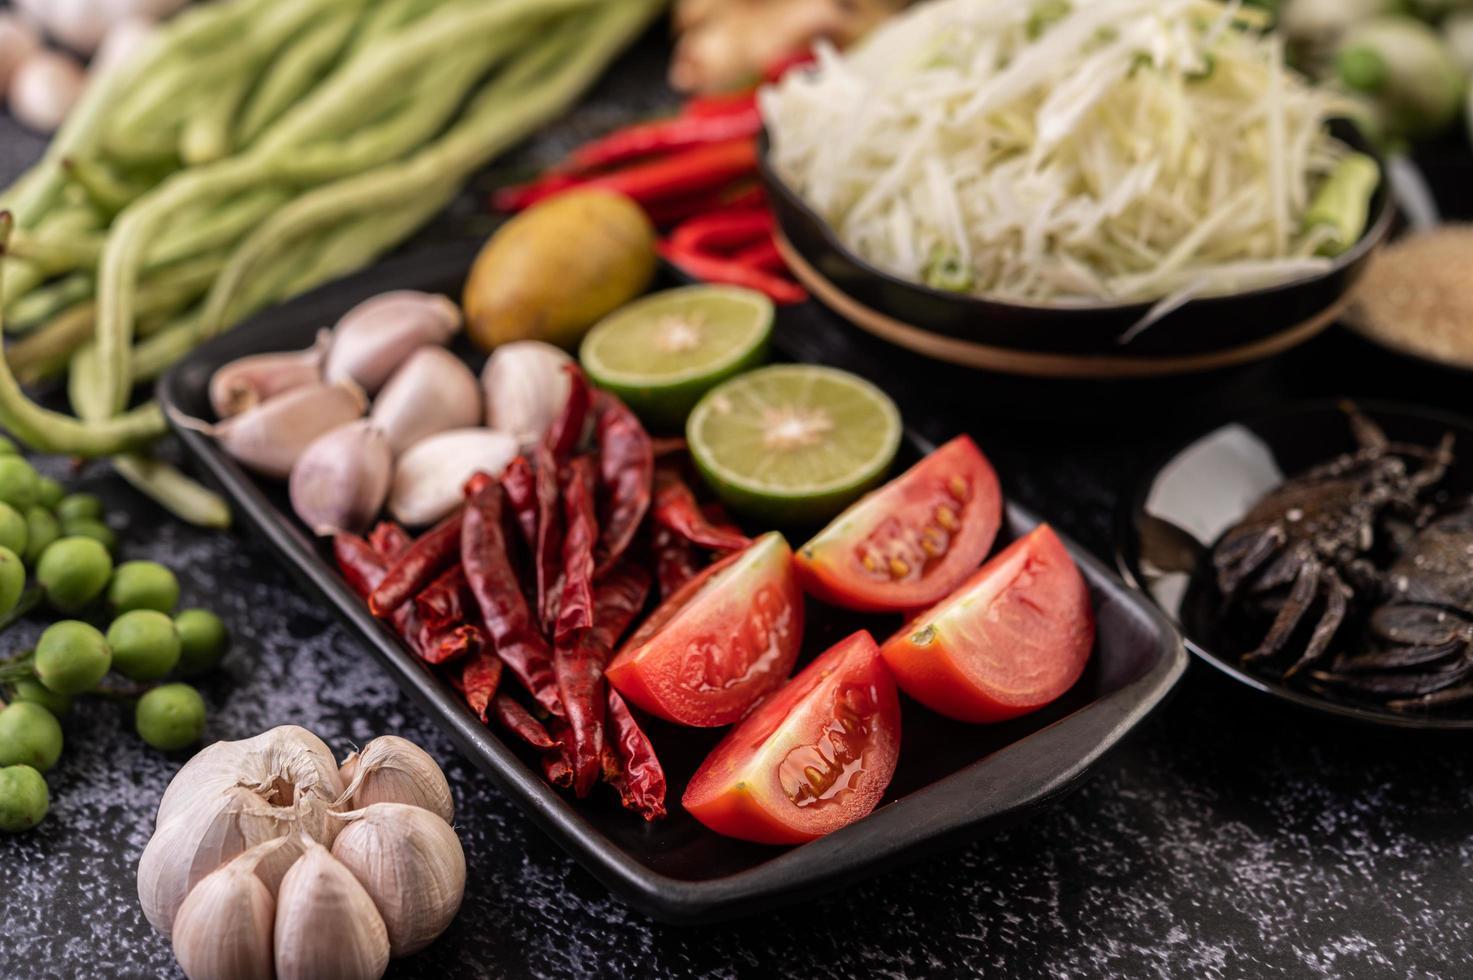 Papaya salad ingredients with fermented fish photo